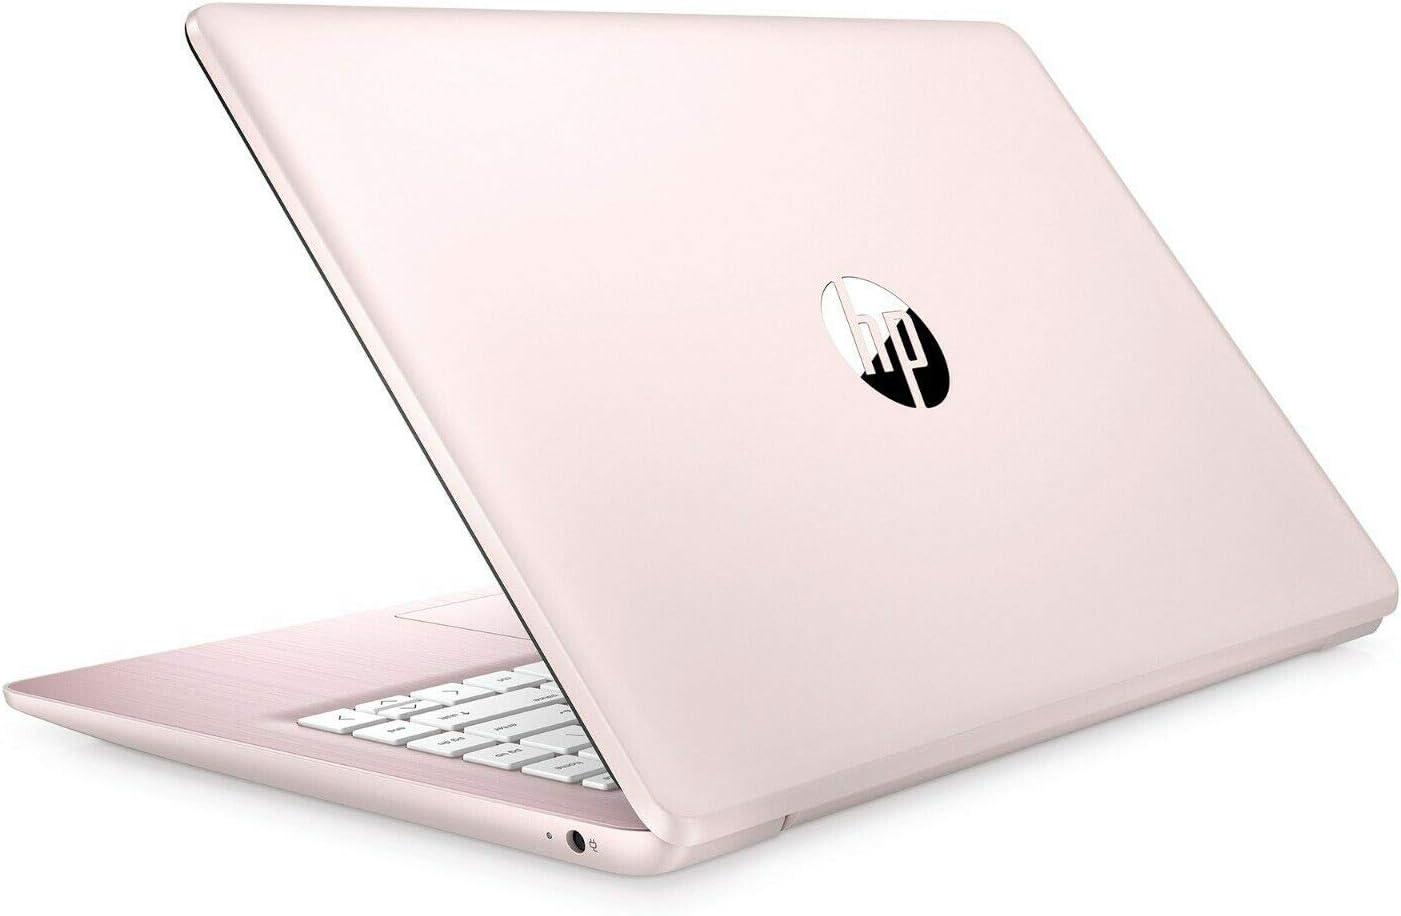 HP Stream 14 Pink - Celeron N4000 - 4 GB RAM - 64 GB eMMC Storage - 14